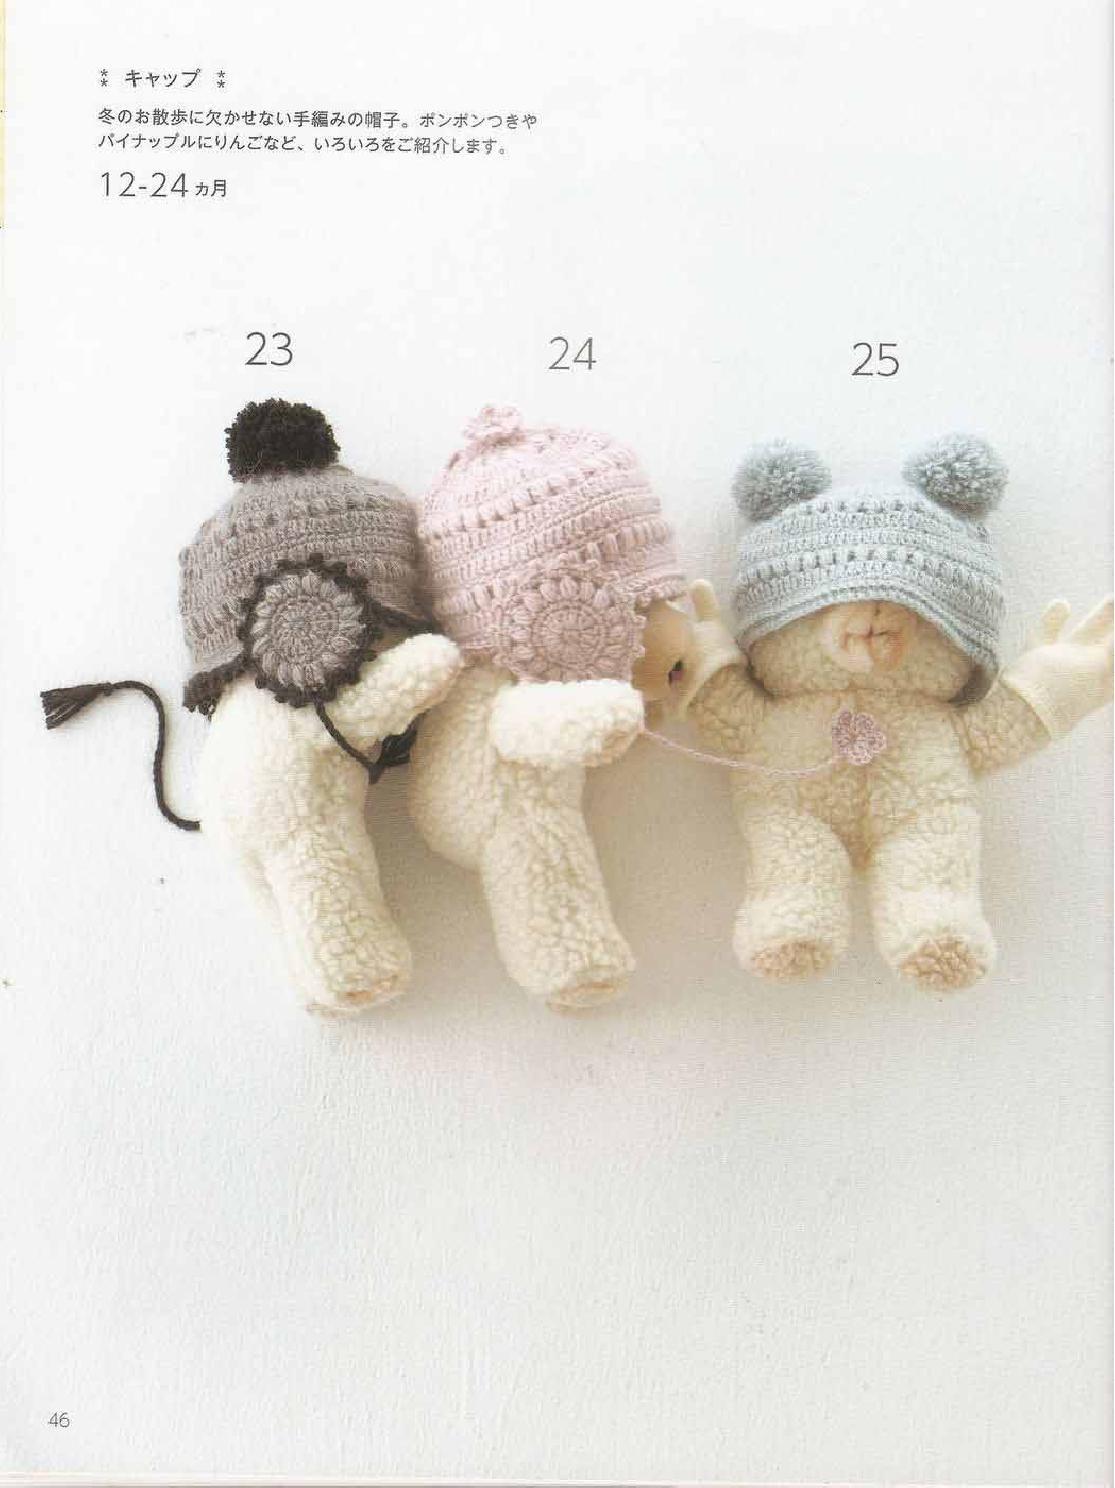 Happy crochet time for my baby | bebes | Pinterest | Gorros, Bebé y Bebe